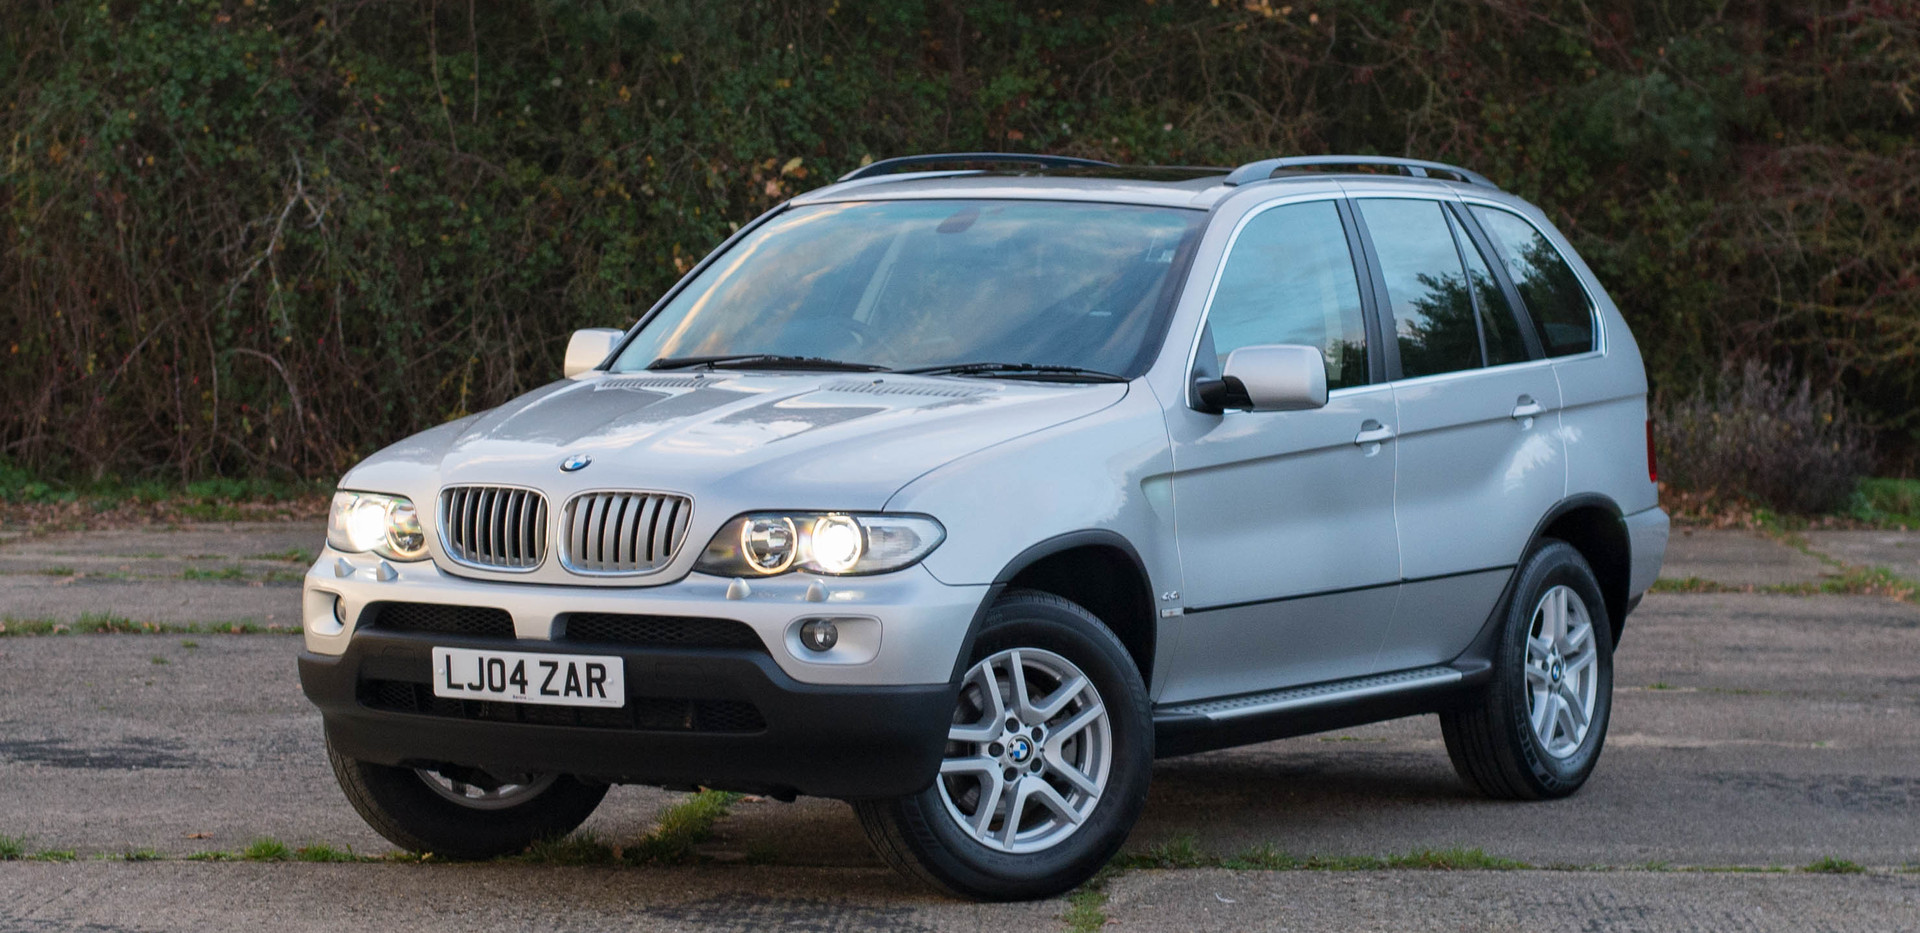 BMW E53 X5 4.4i For Sale UK London  (40